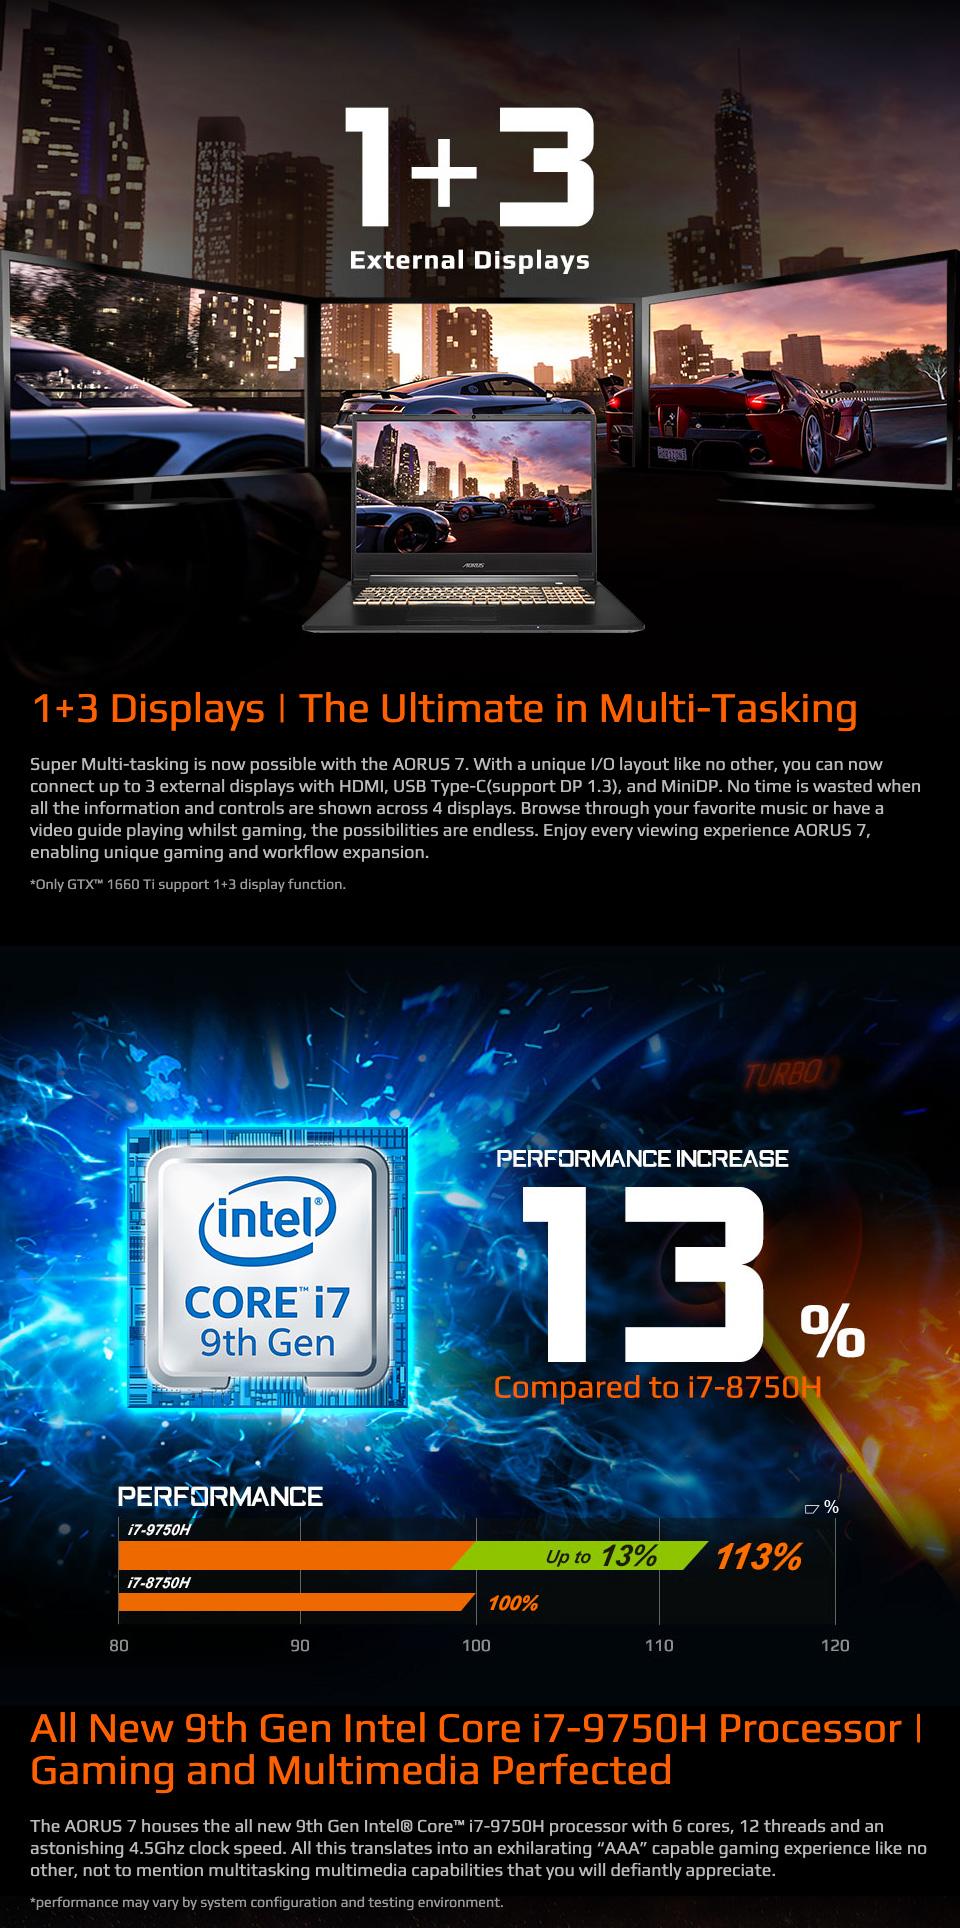 Gigabyte Aorus 7 Core i7 GTX 1660Ti 17.3in 144 Hz Notebook features 3